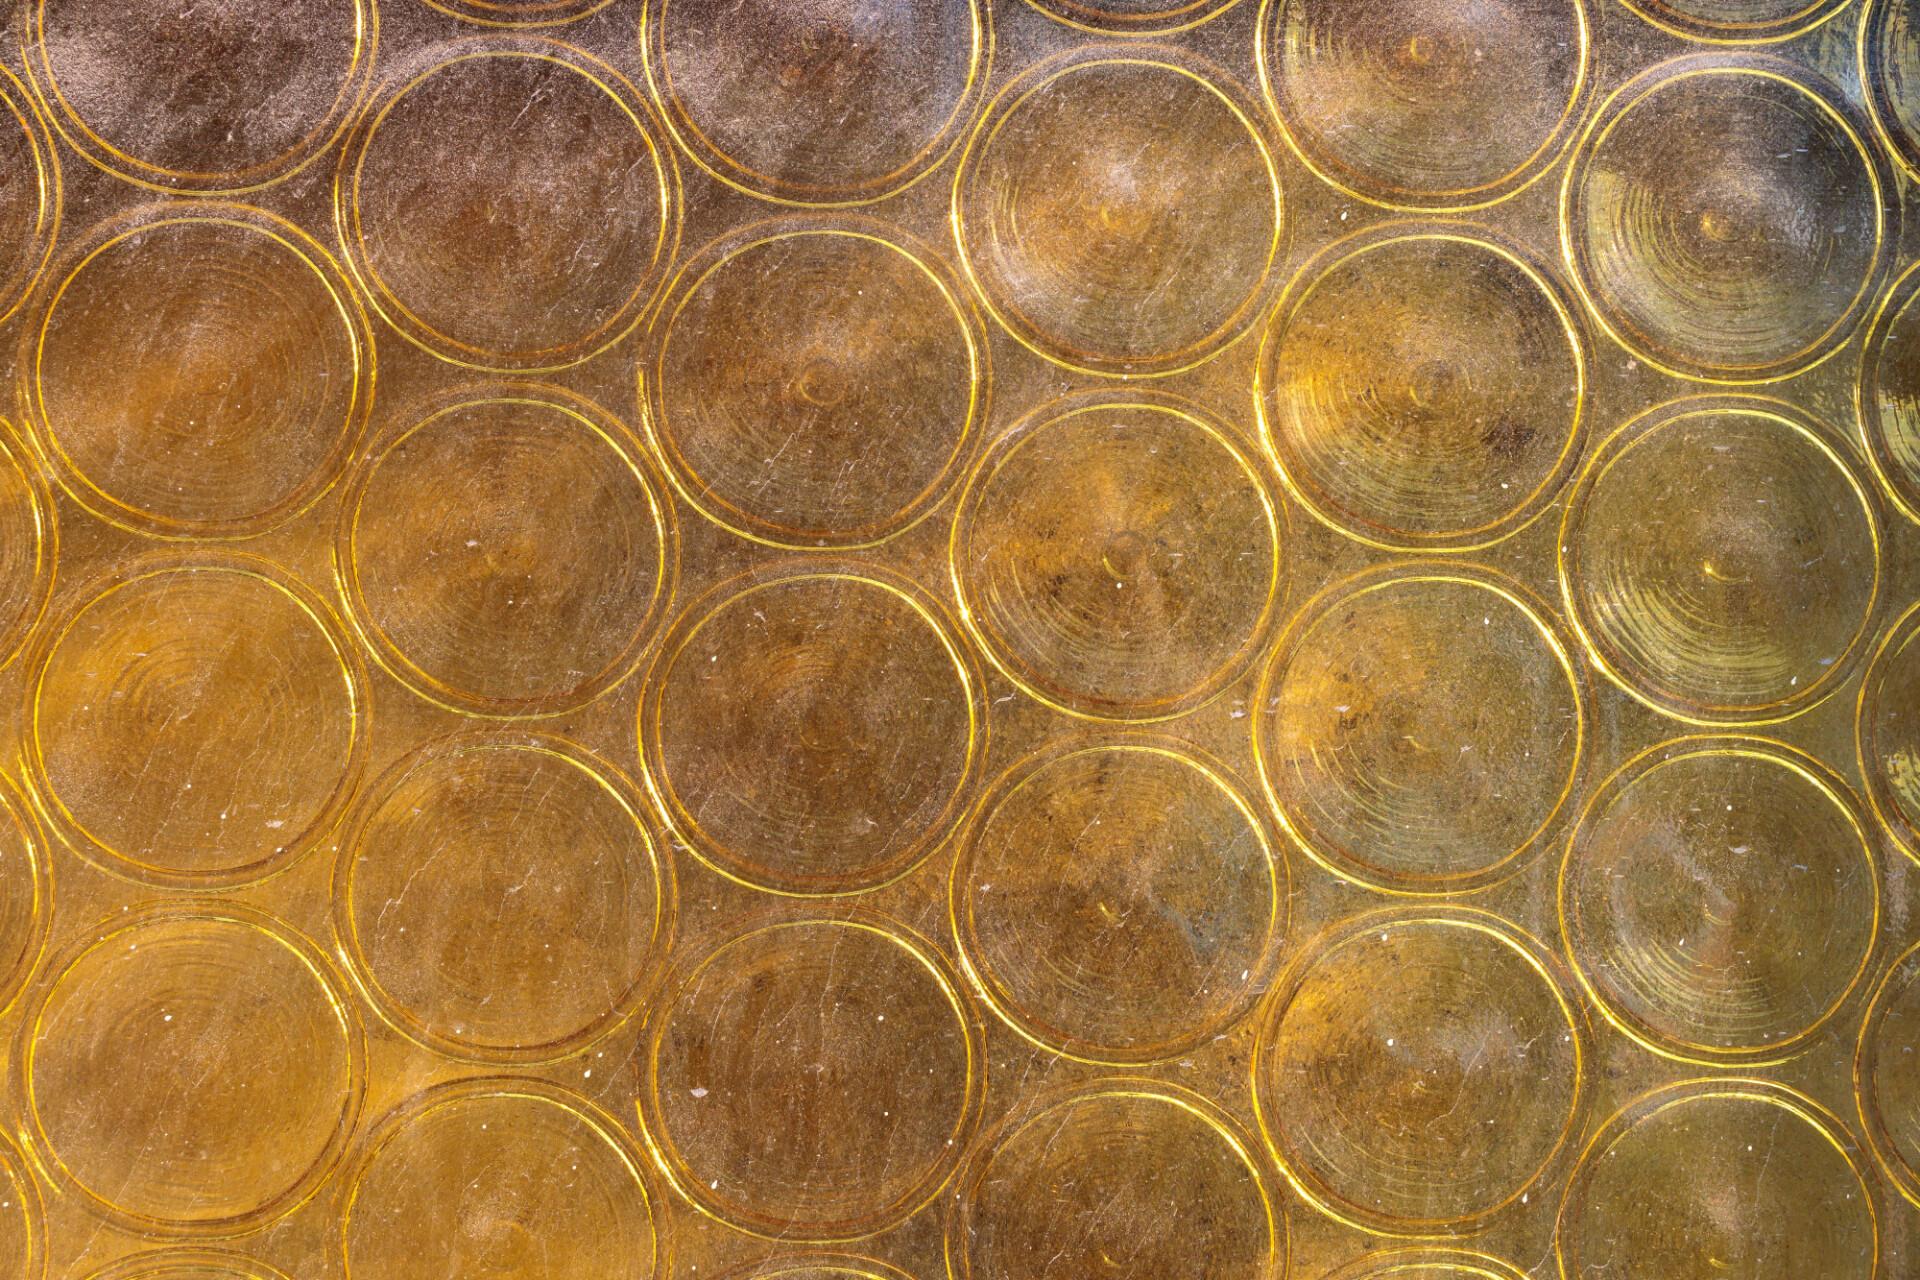 Yellow glass window texture